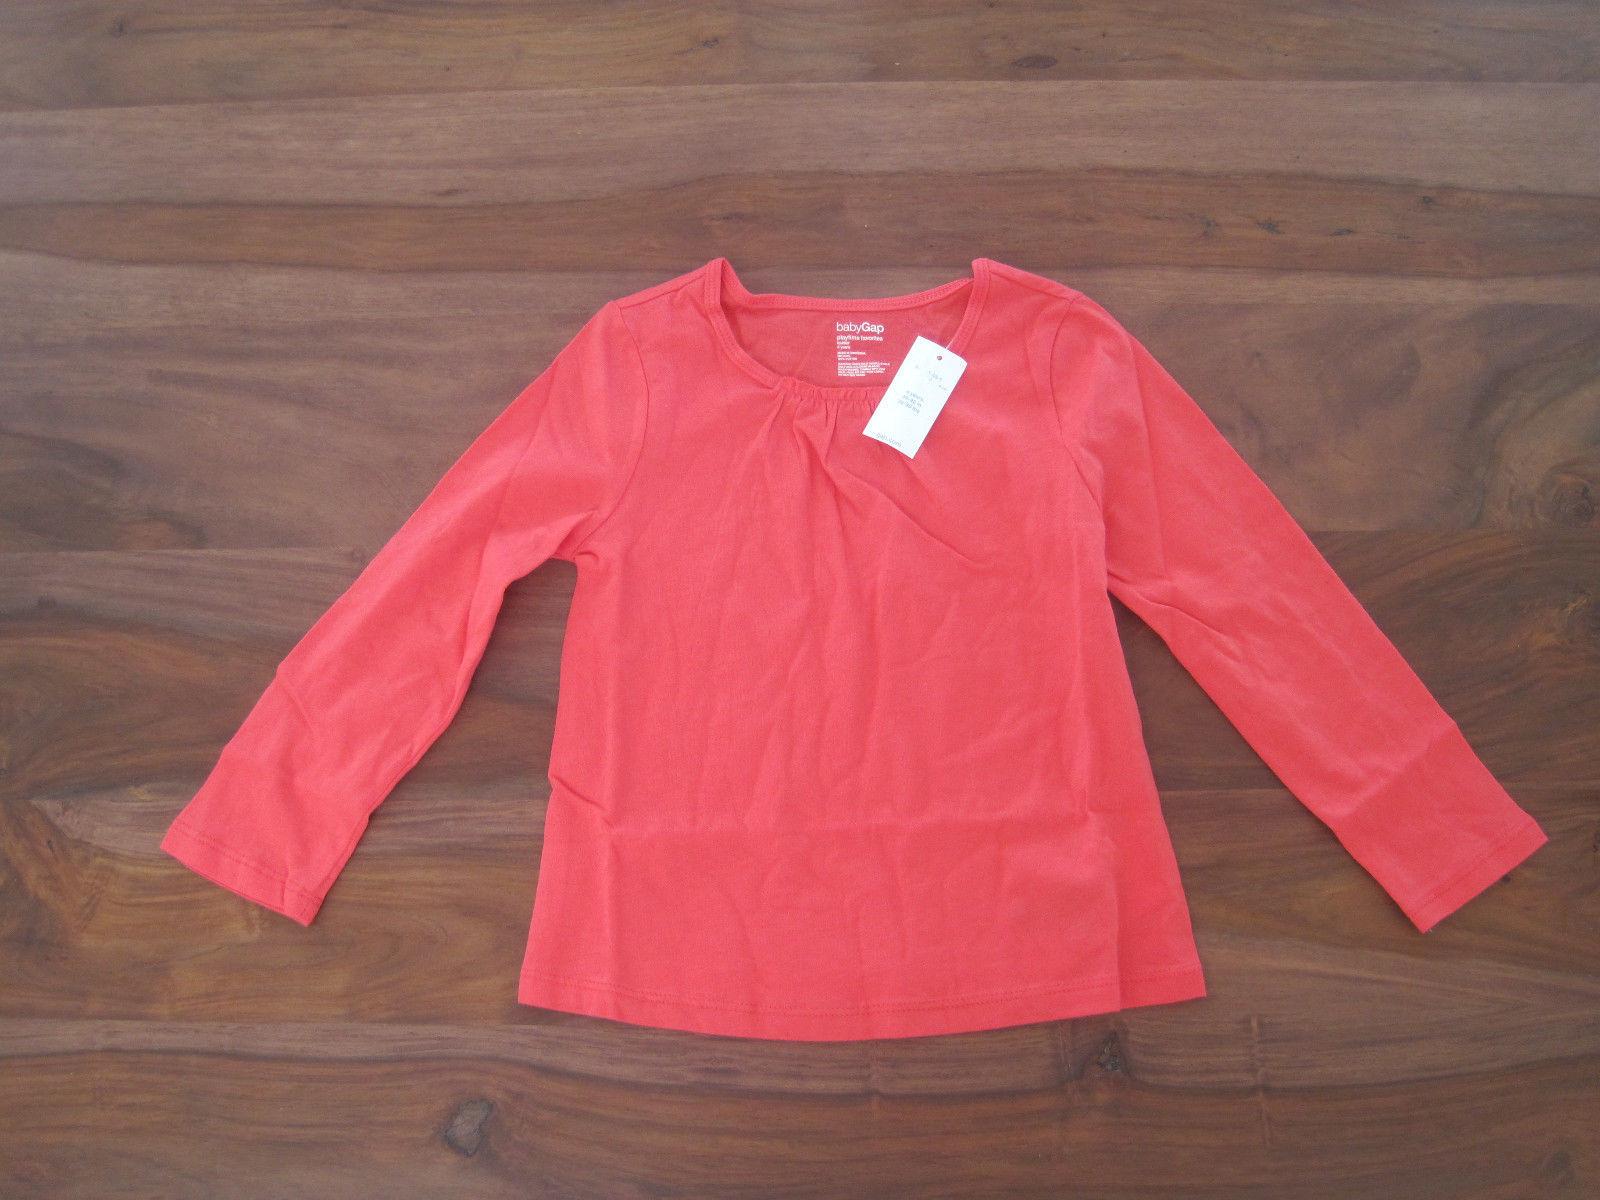 Gap Baby Girl Tee Top  Sz 4 Orange Ruffle Long Sleeve Roun Neck 100%  Cotton New